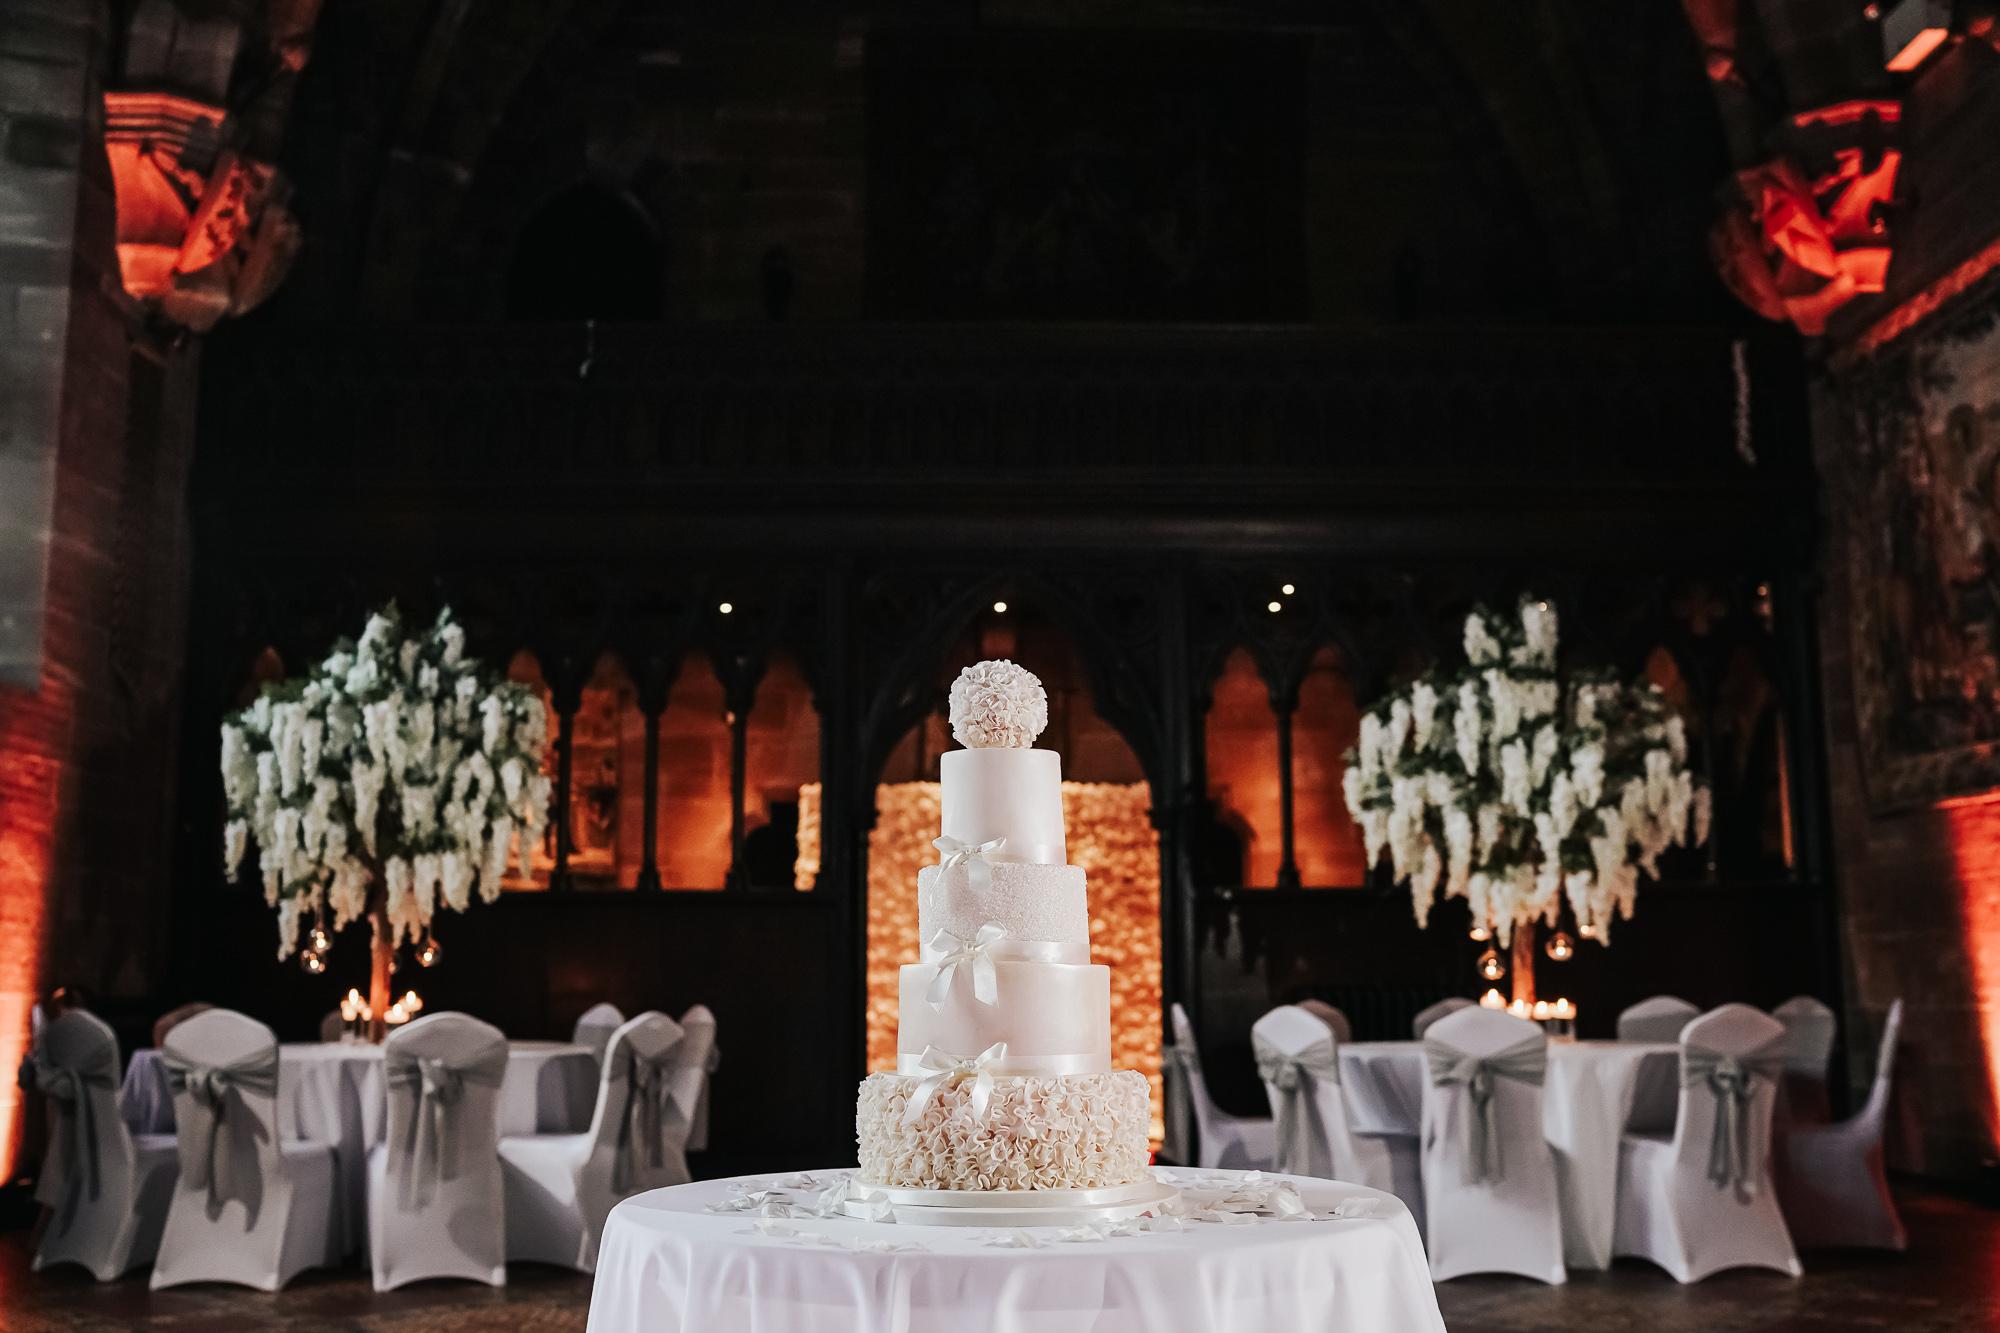 Peckforton Castle wedding photography cheshire wedding photographer (51 of 57).jpg